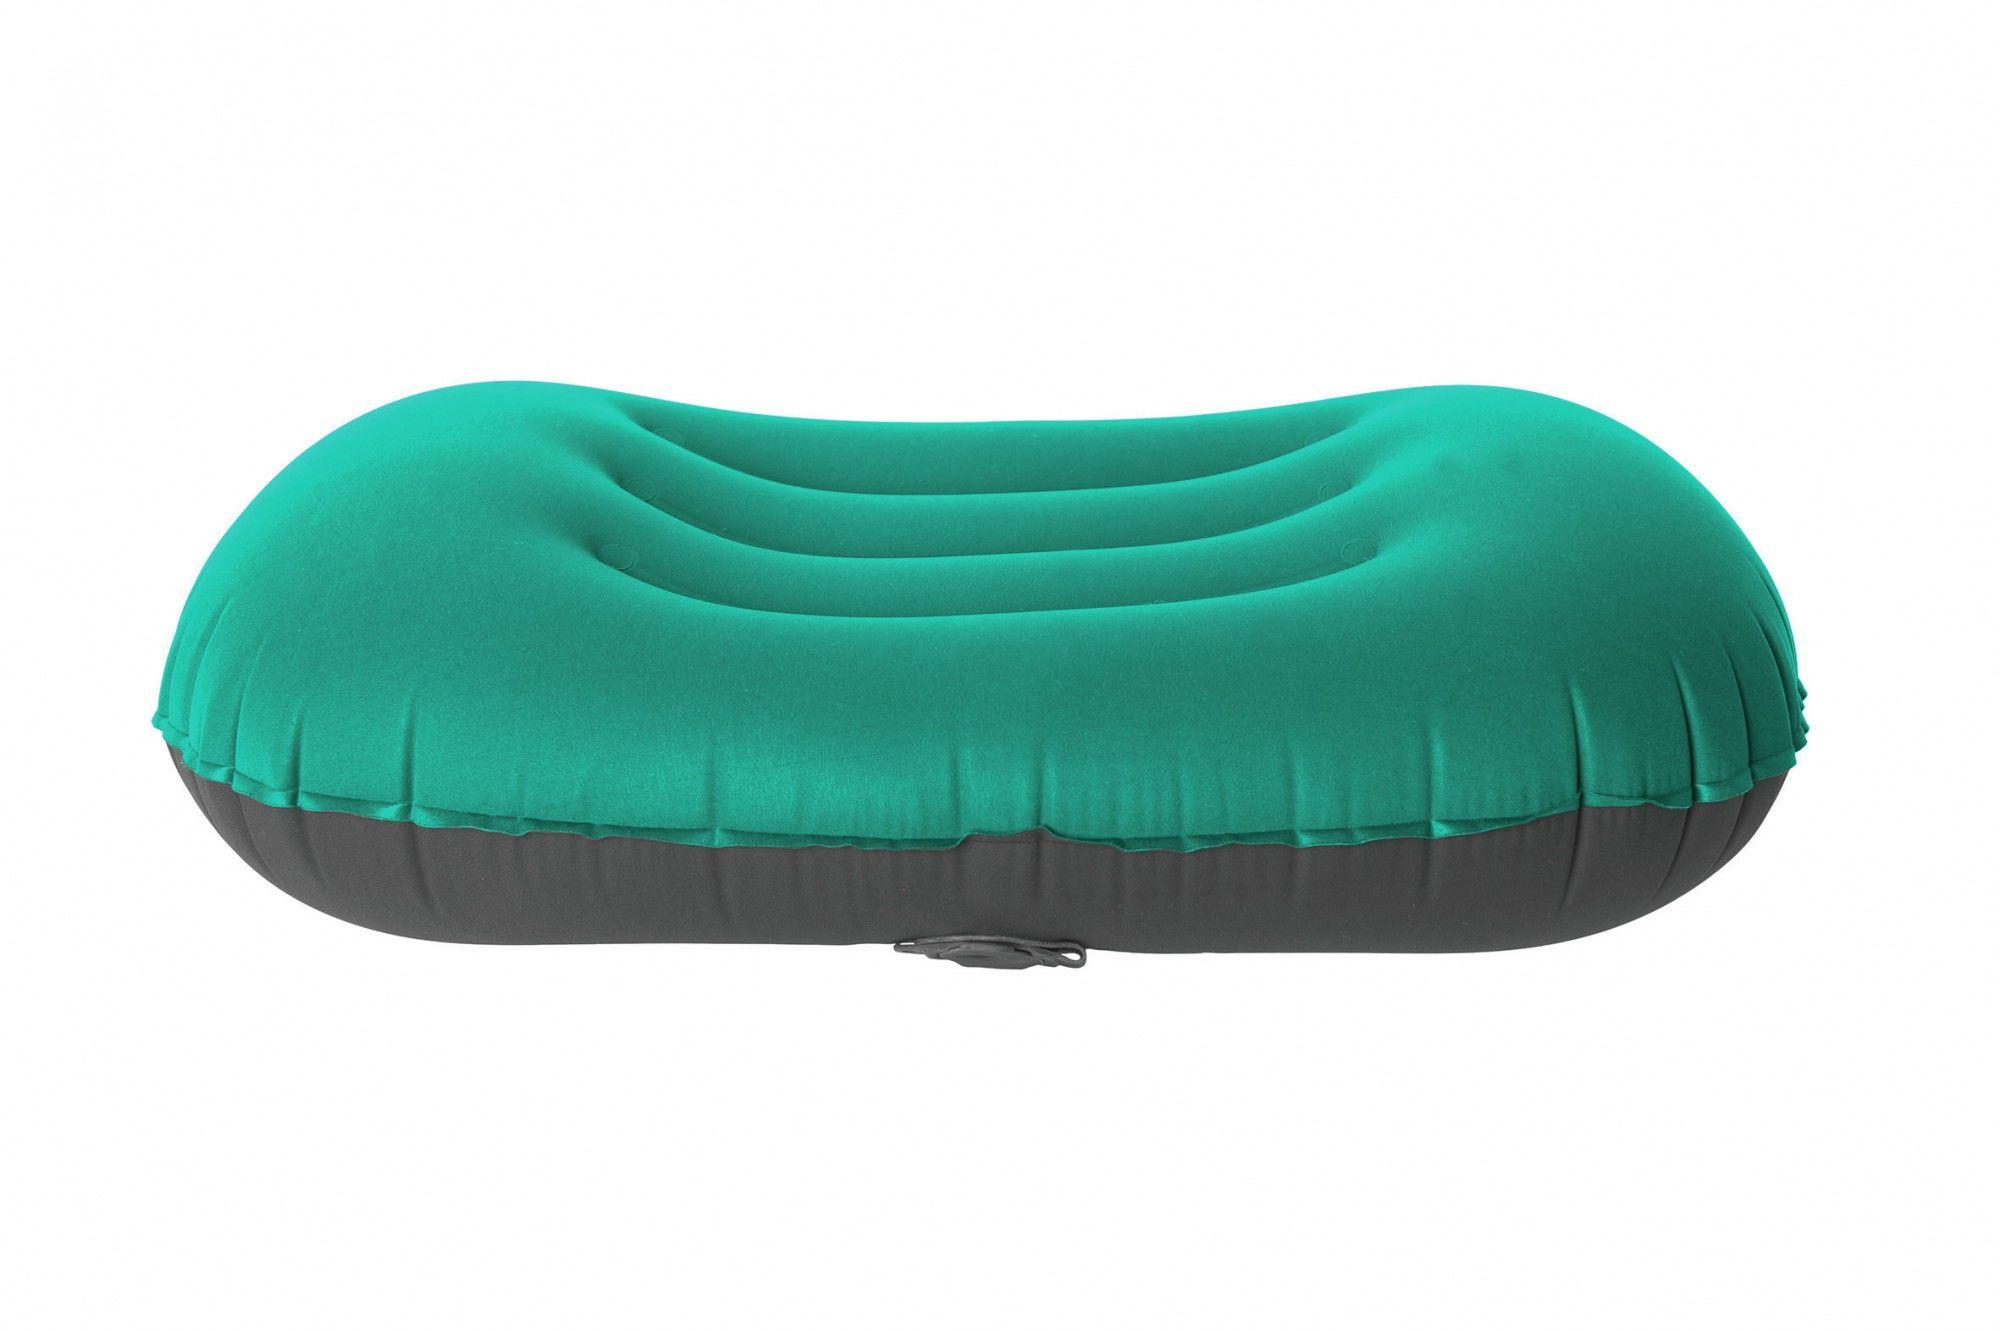 Sea to Summit Aeros Ultralight Pillow Large Blau, Kissen, One Size